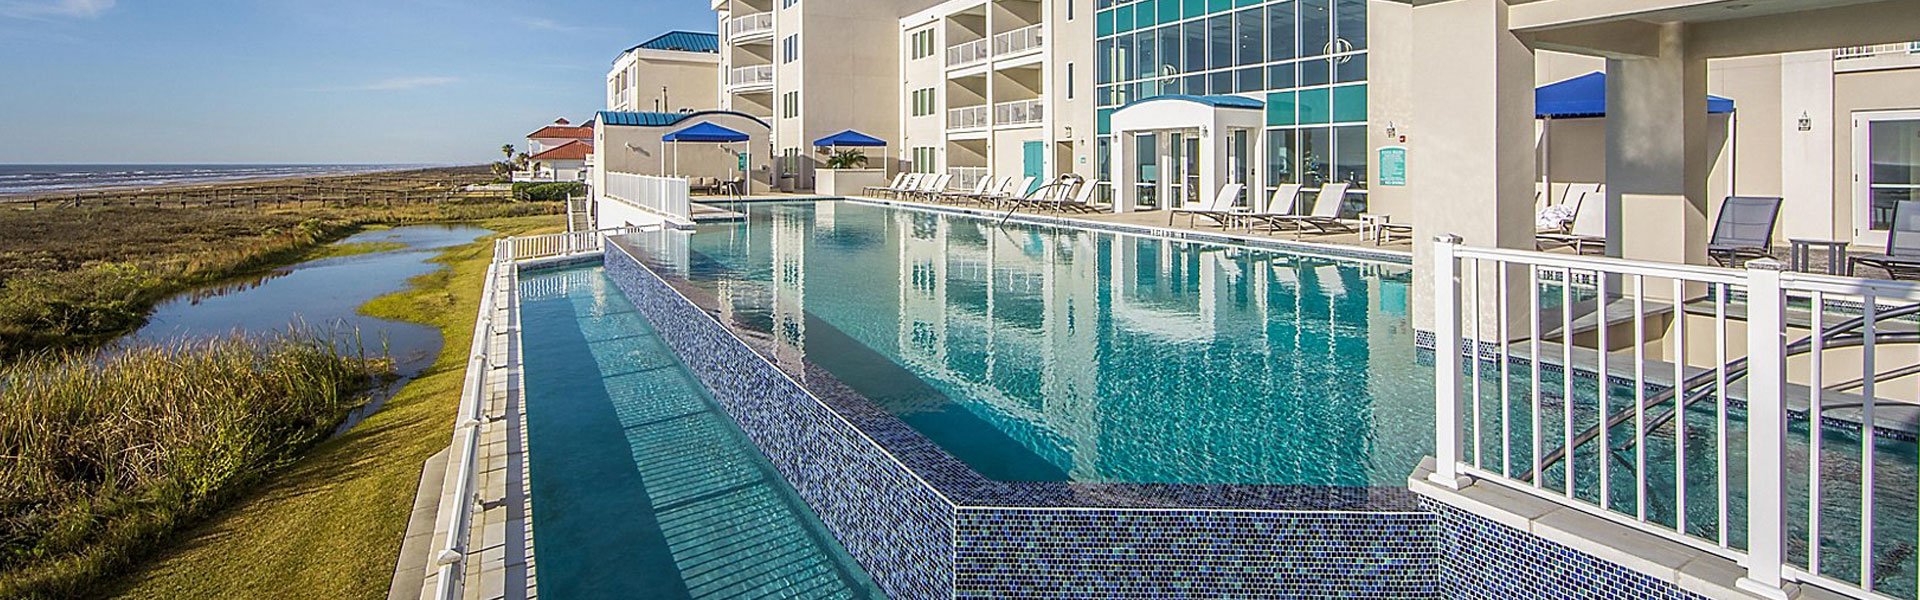 Holiday Inn Club Vacations Seaside Resort